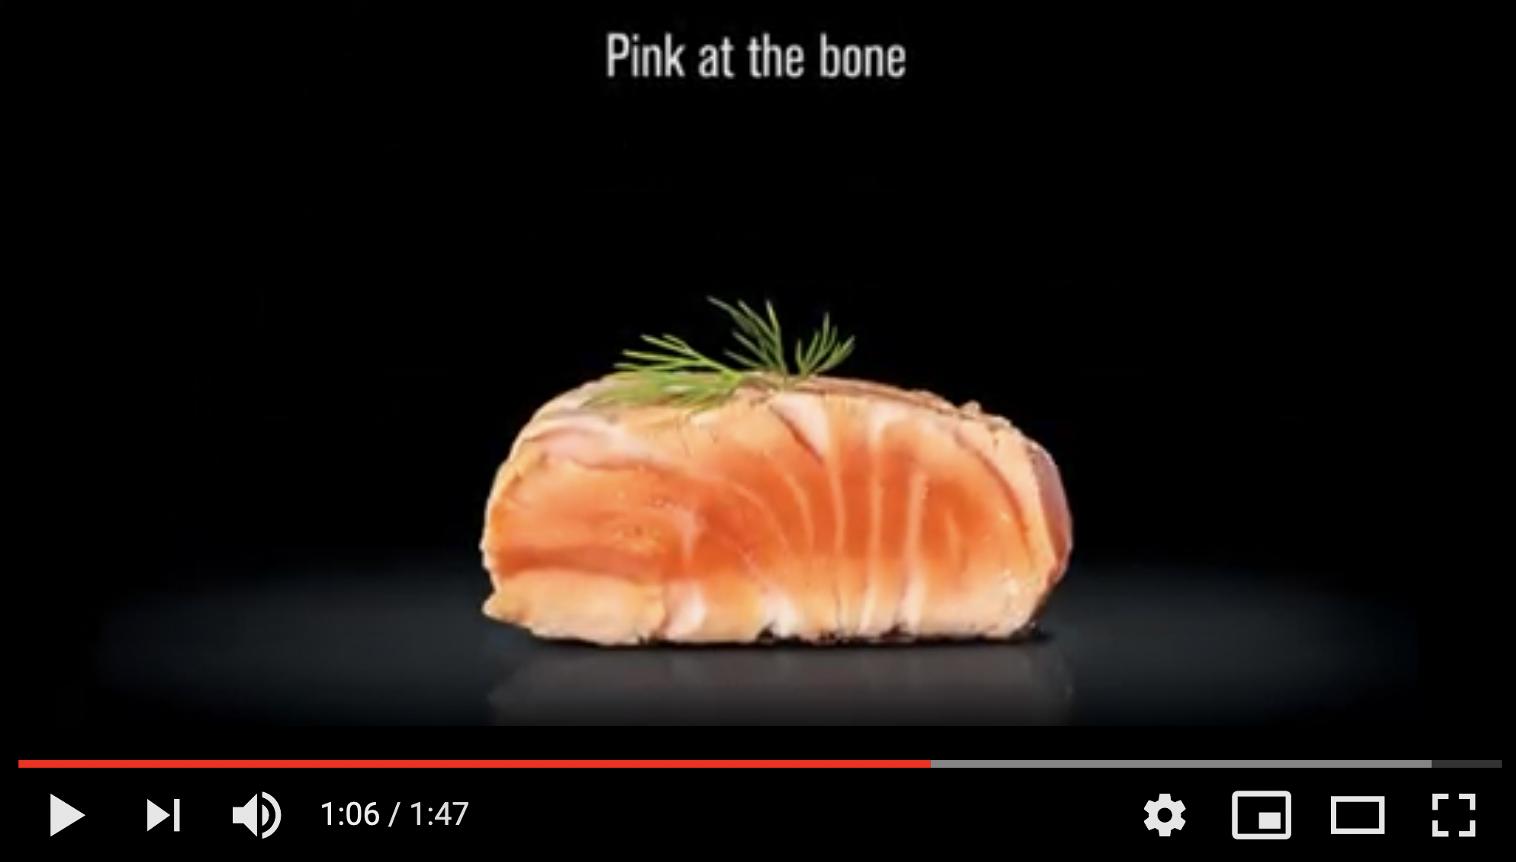 film culinaire recette food style rhone lyon